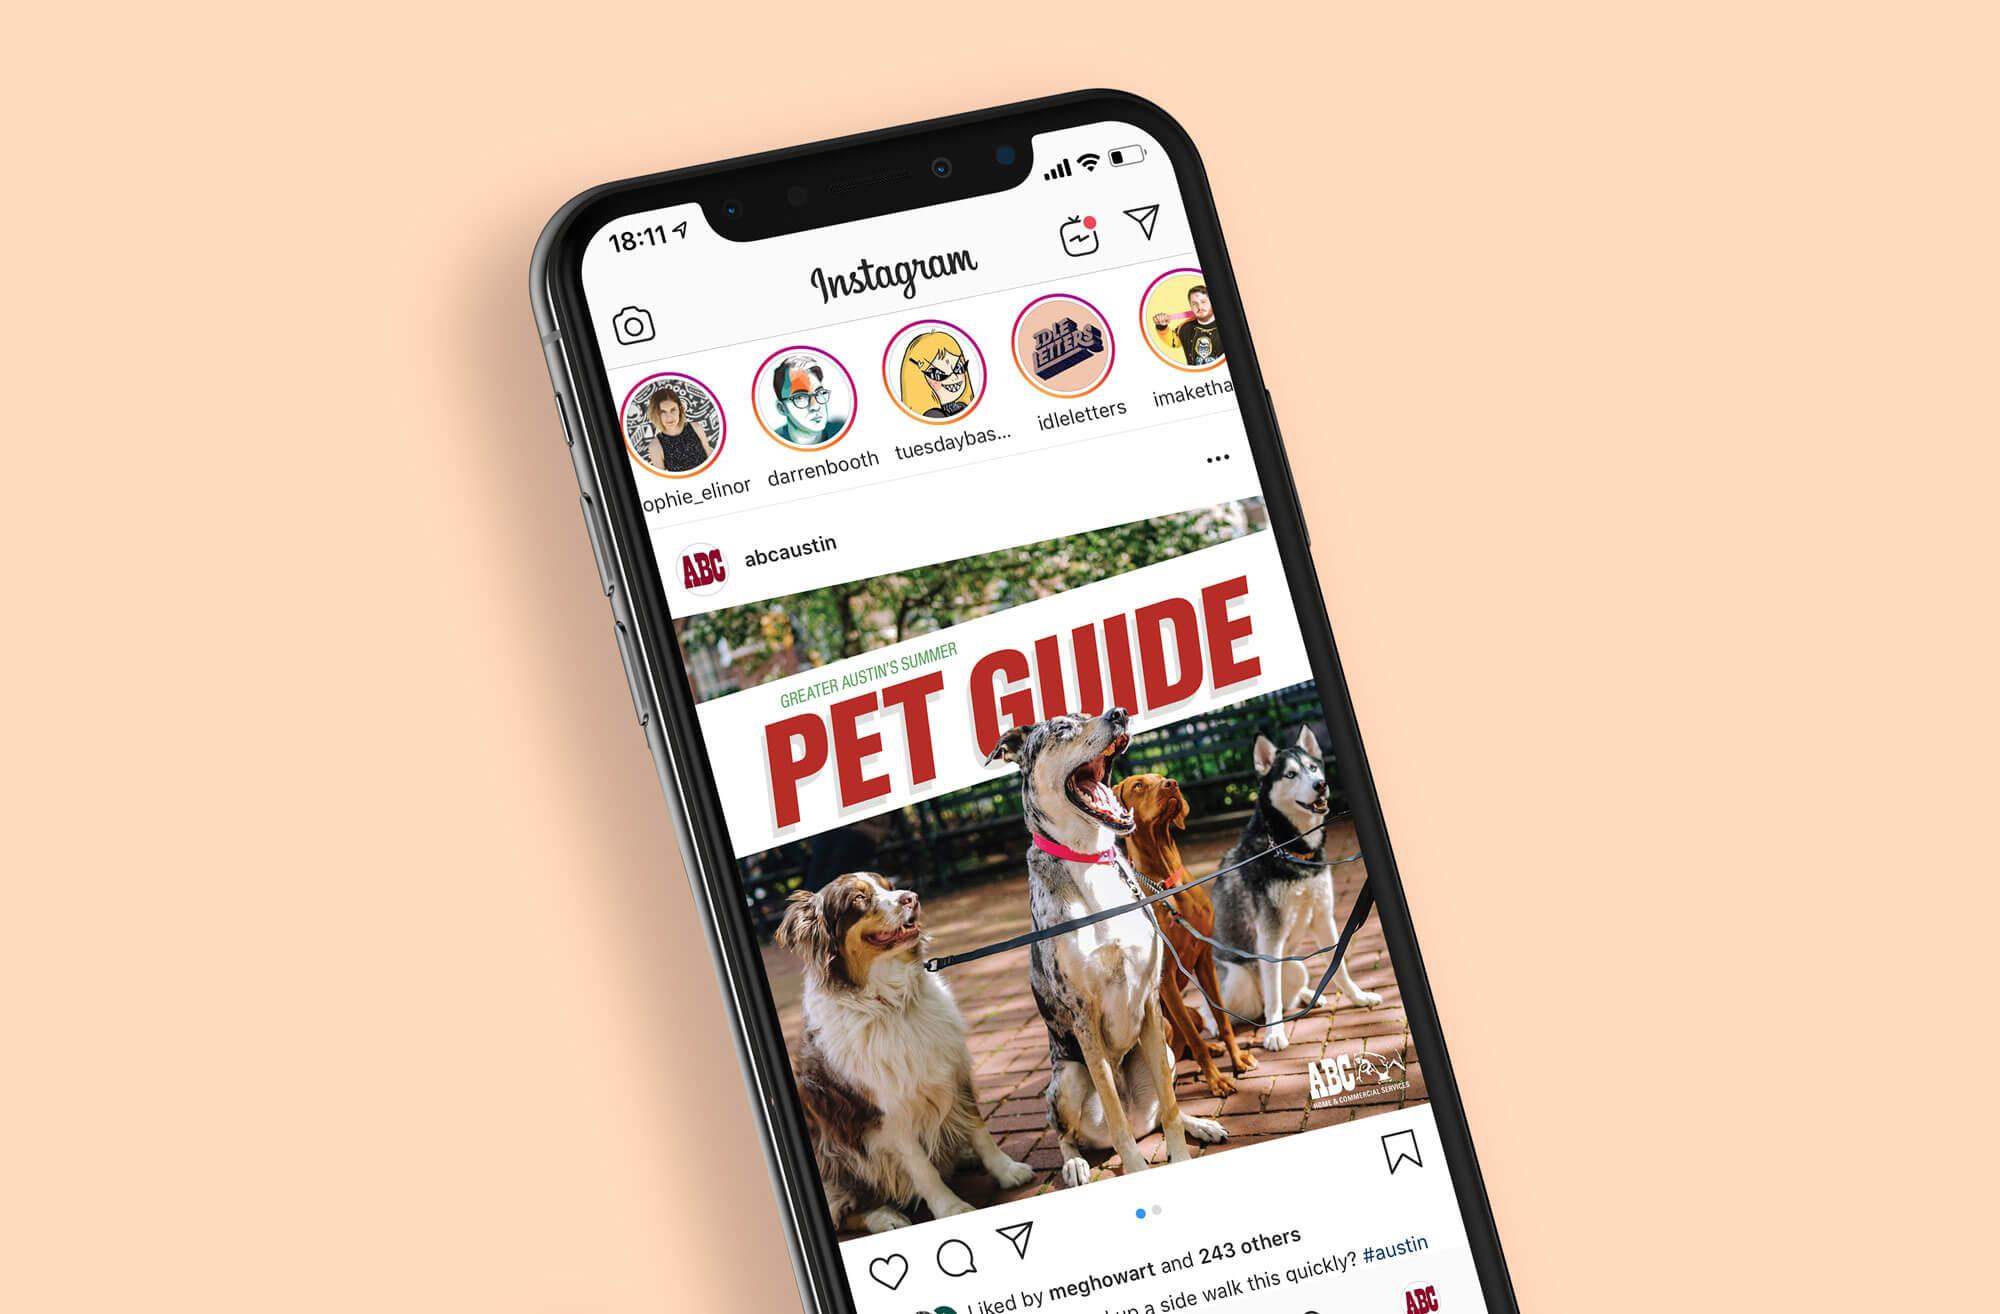 Pet guide instagram web